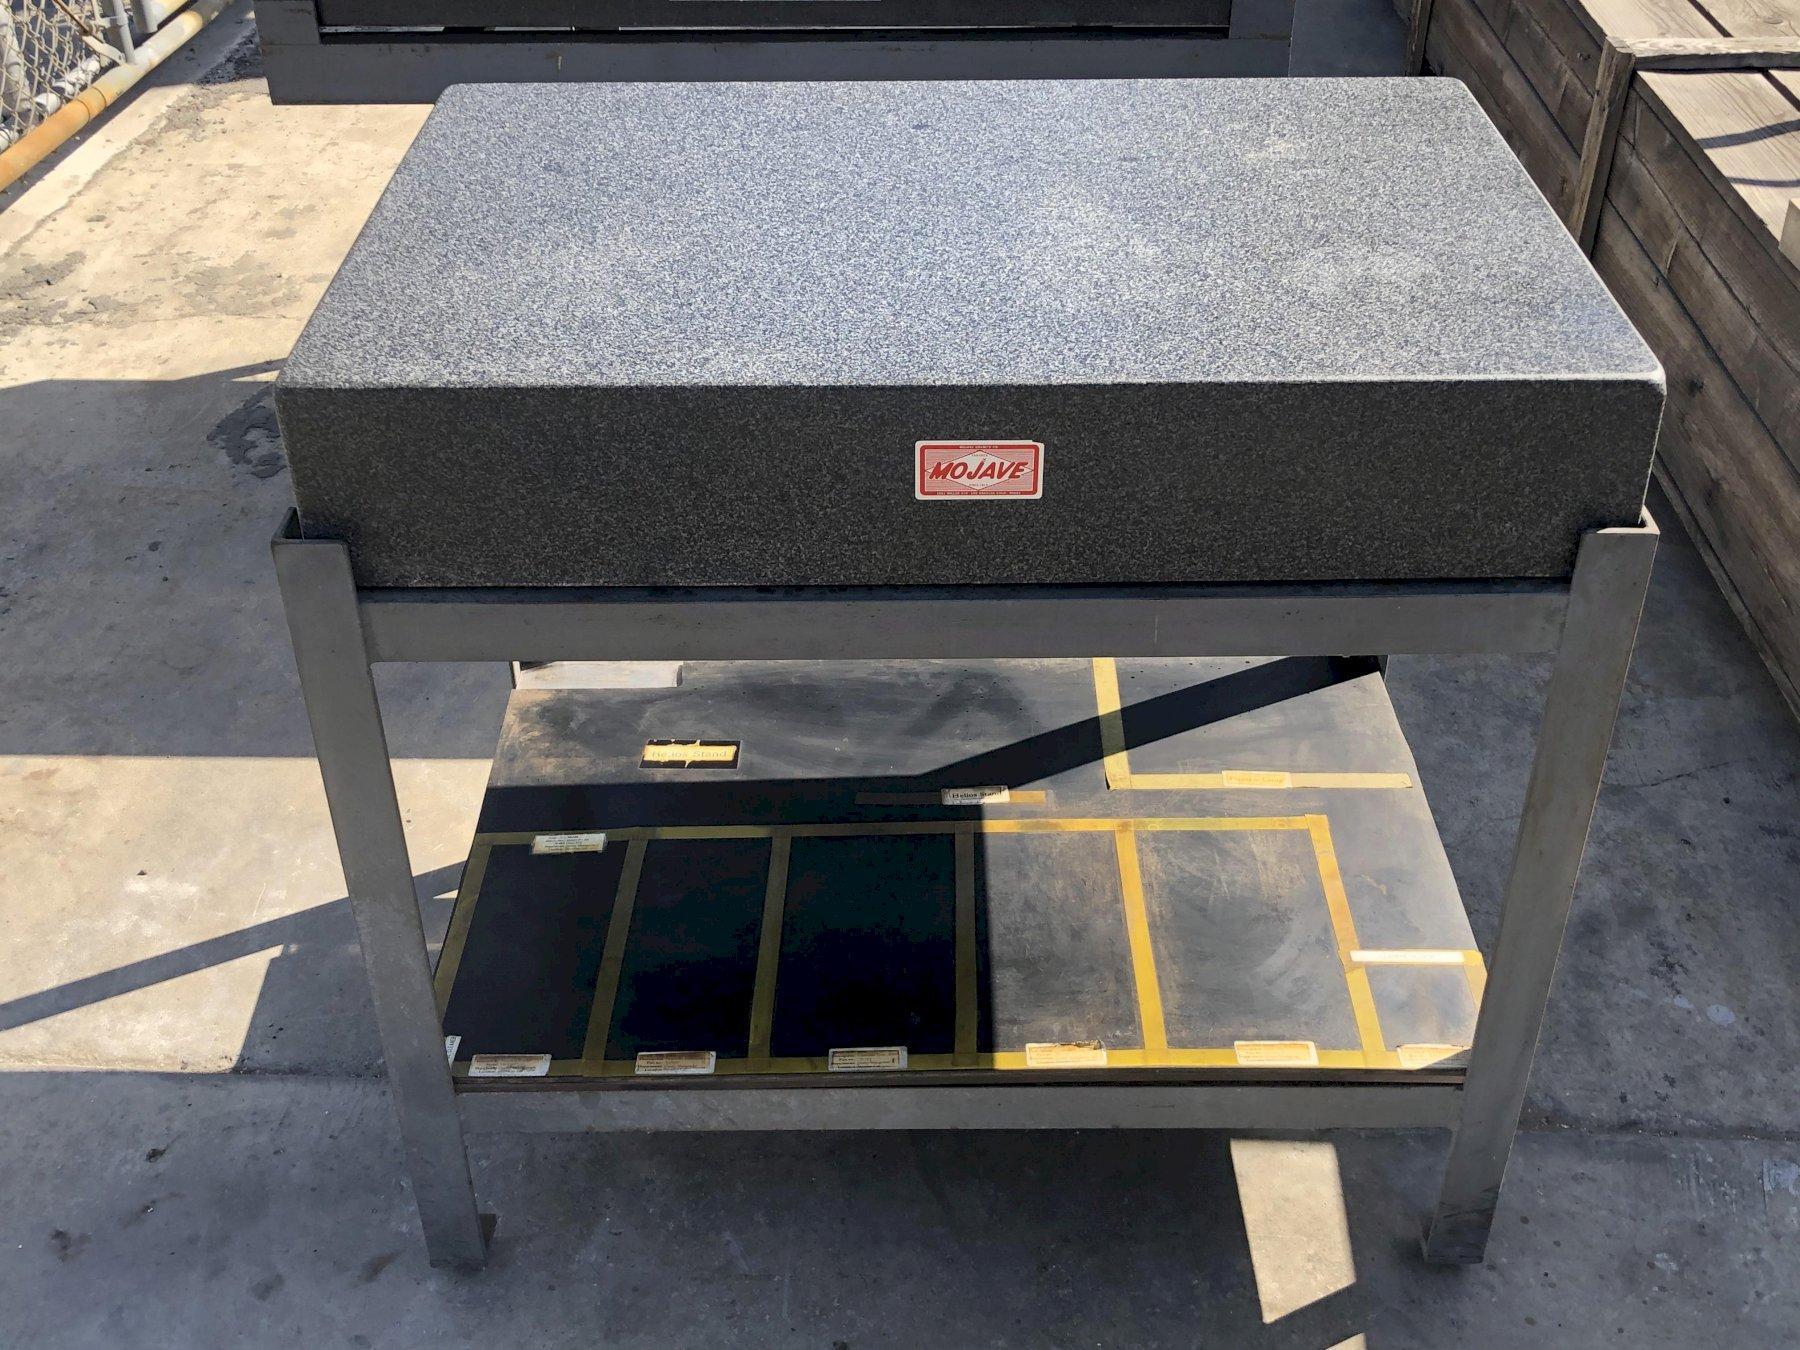 "Standridge Surface Granite Plate 36"" x 24"" x 6"" with Stand, Grade AA."